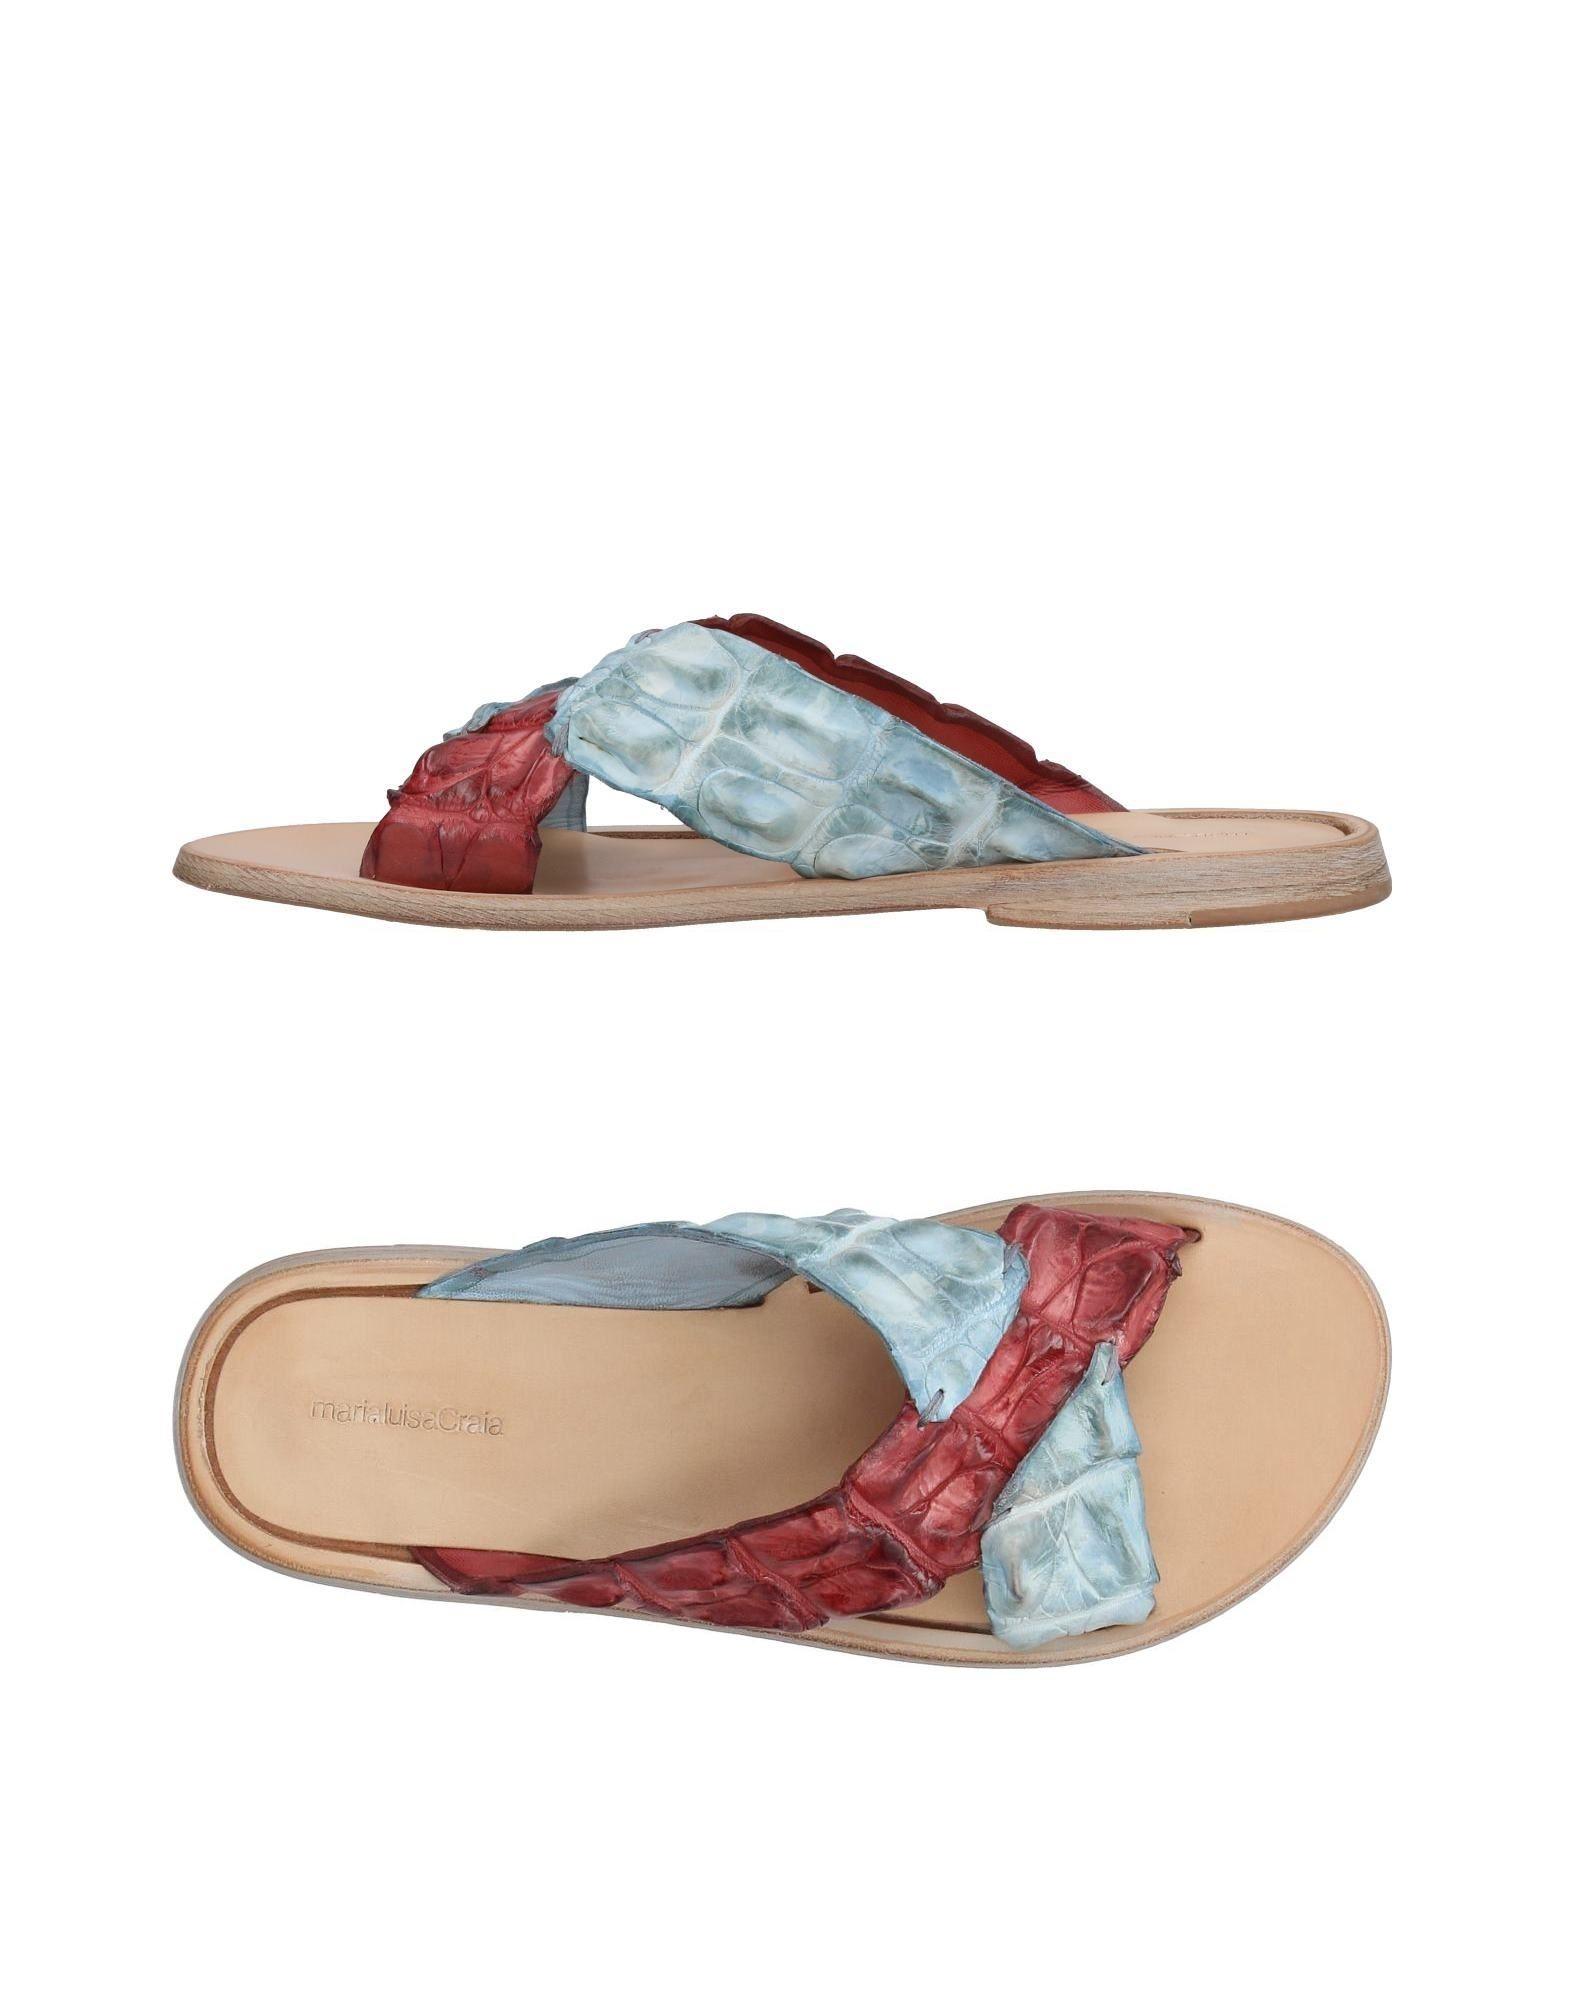 Marialuisa Craia Sandalen Damen  11415275IS Gute Qualität beliebte Schuhe